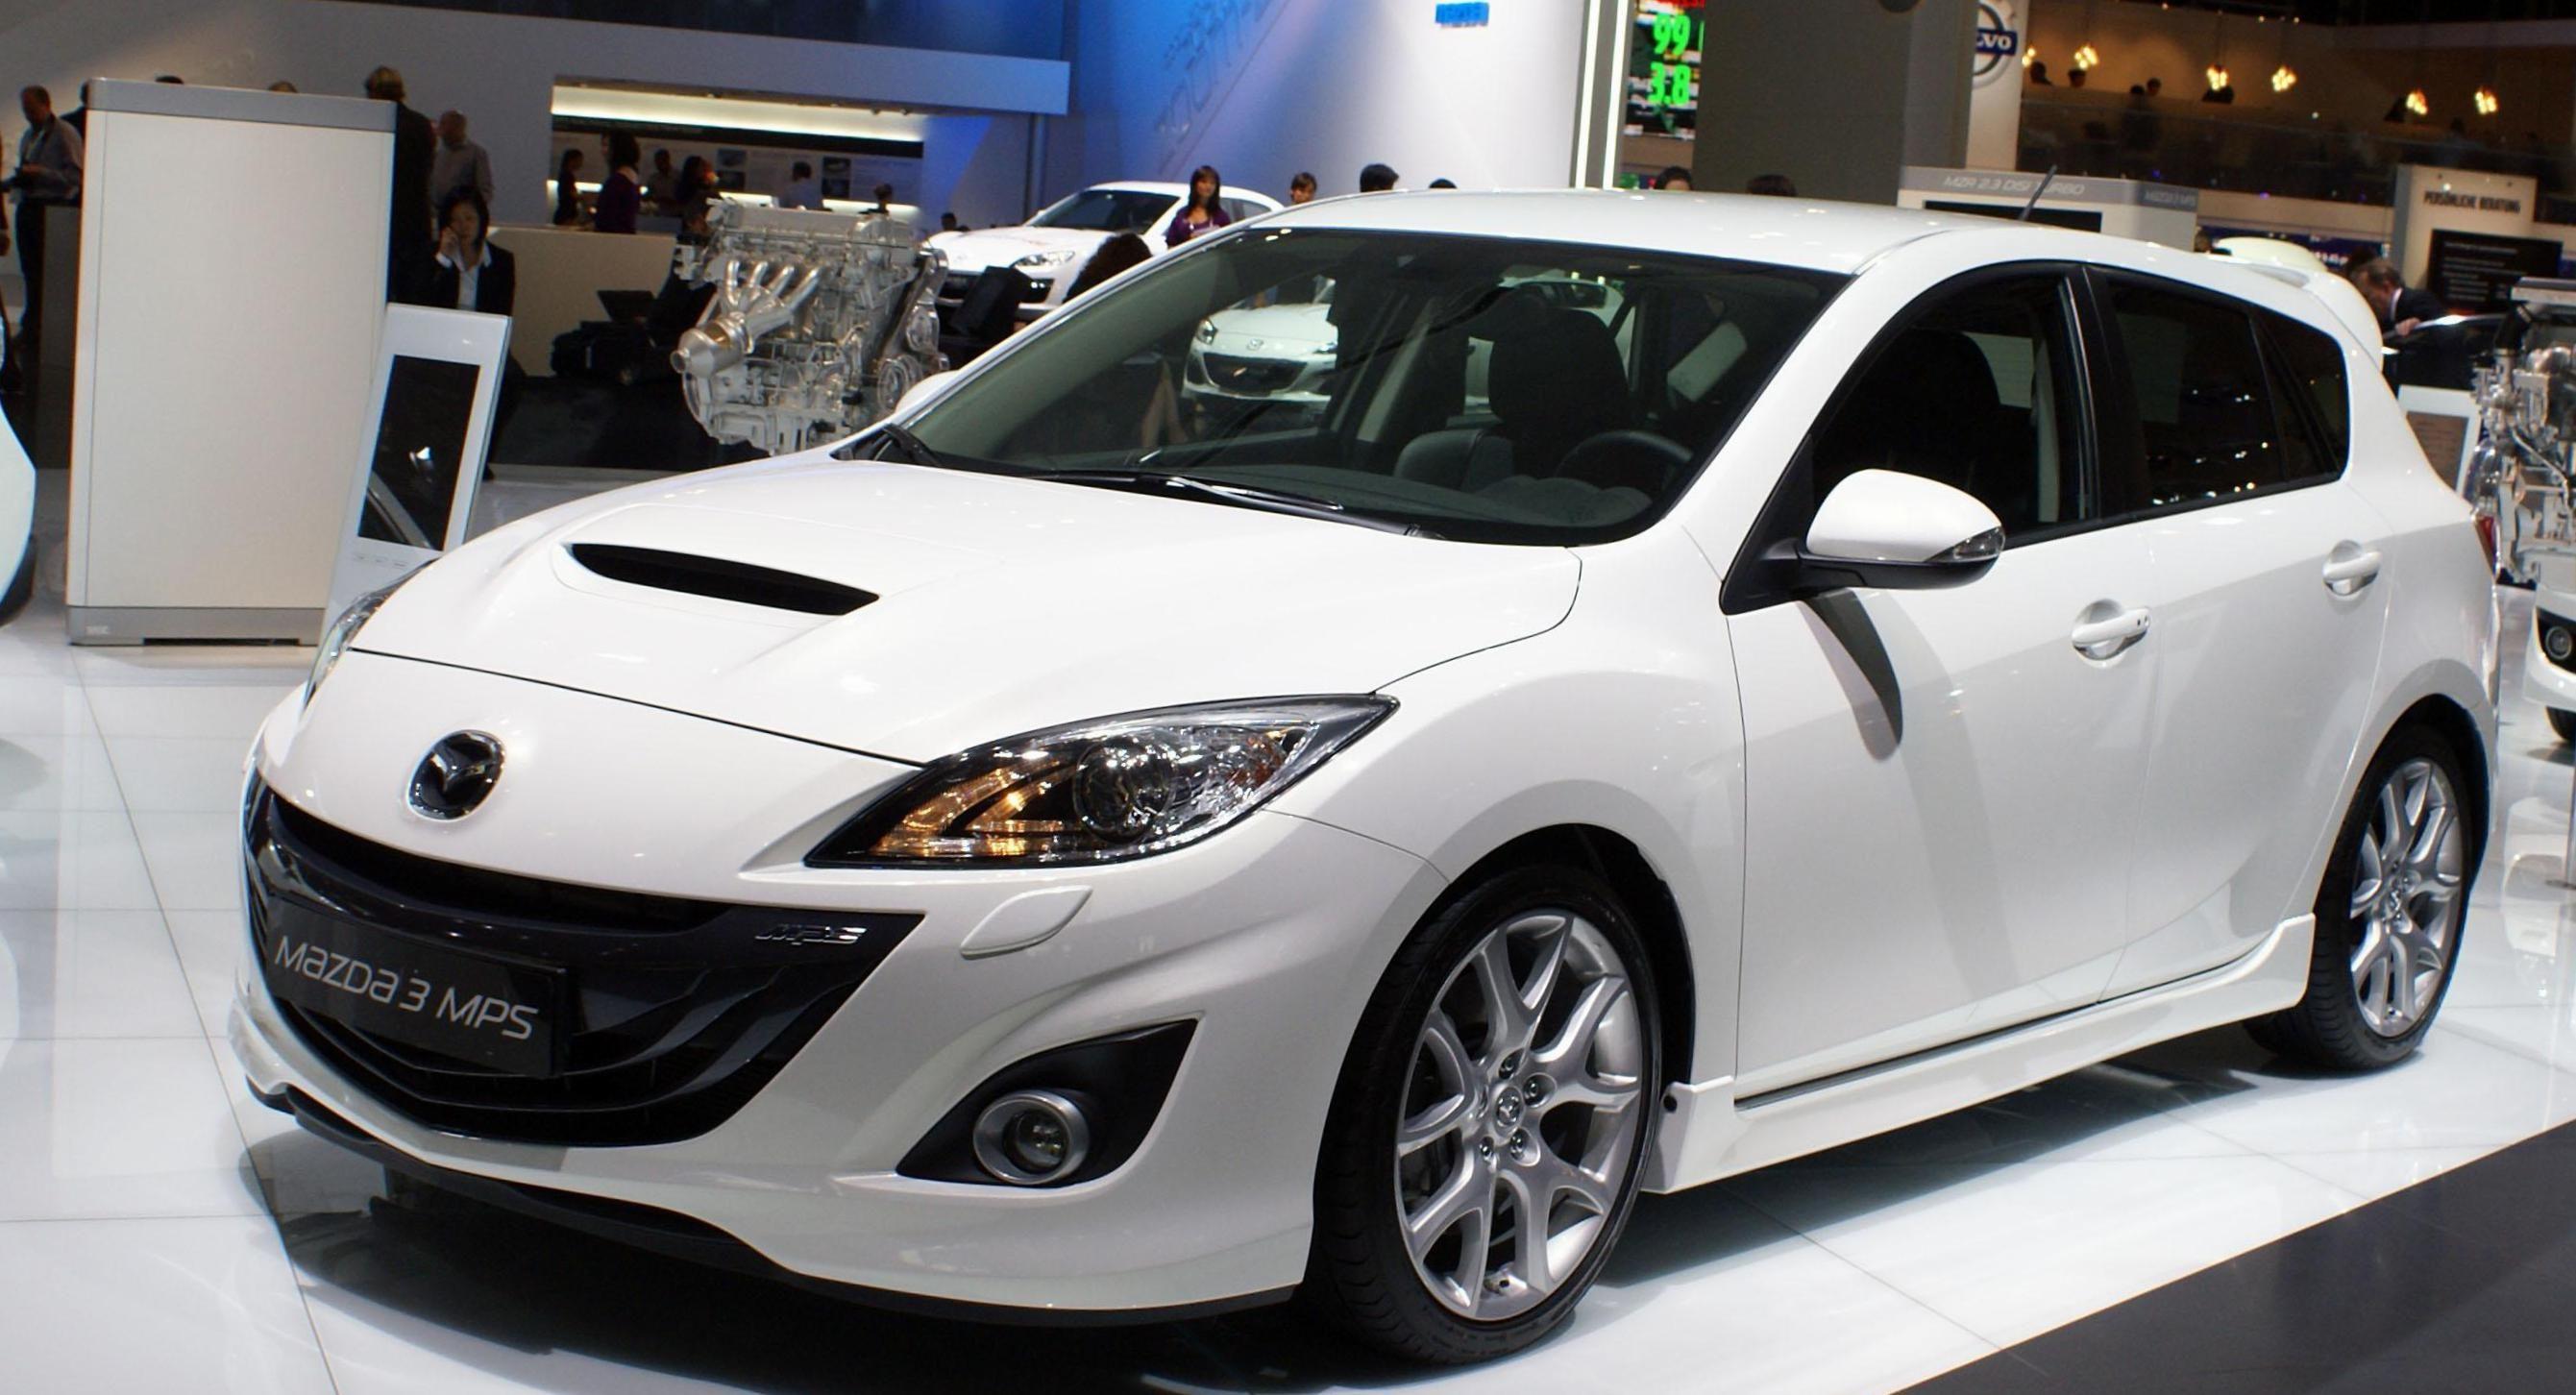 Mazda 3 Mps Photos And Specs Photo 3 Mps Mazda Characteristics And 22 Perfect Photos Of Mazda 3 Mps Mazda Mazda 3 Mps Mazda 3